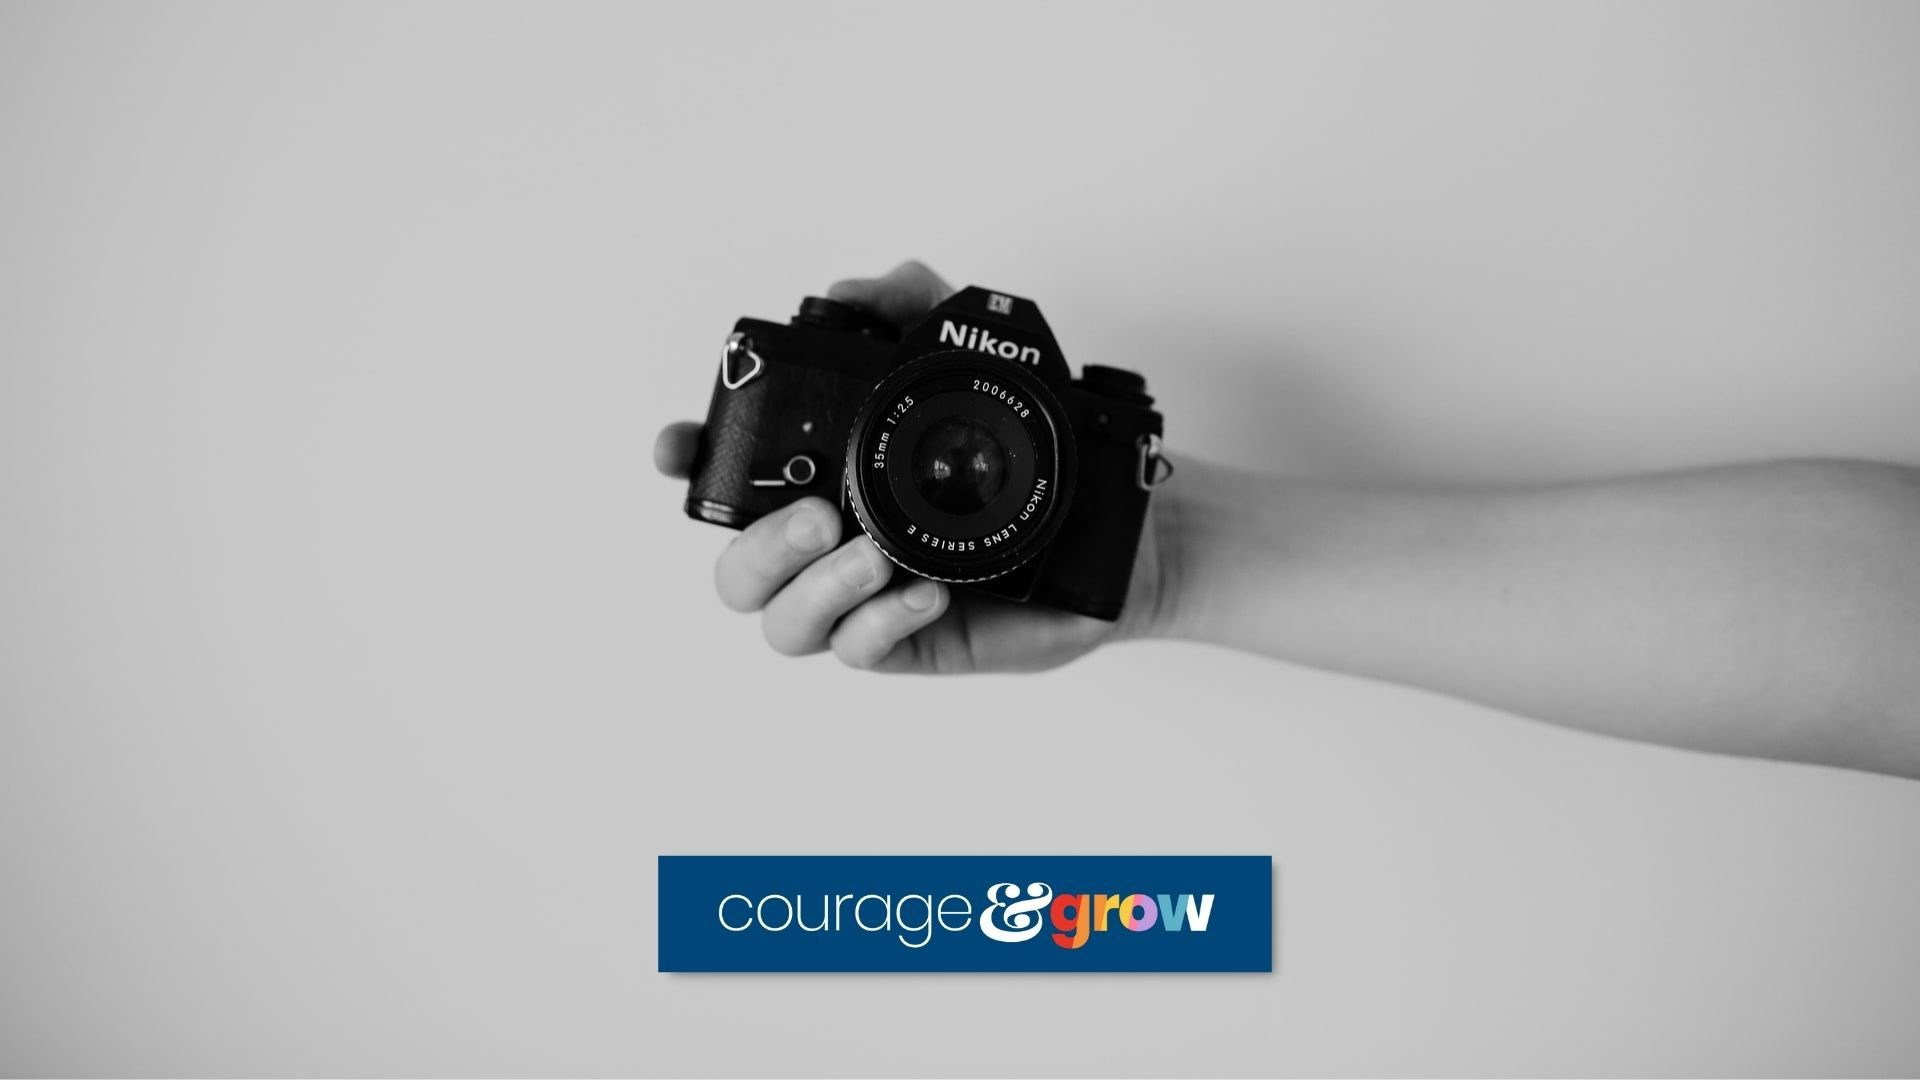 hand holding nikon camera with cg logo